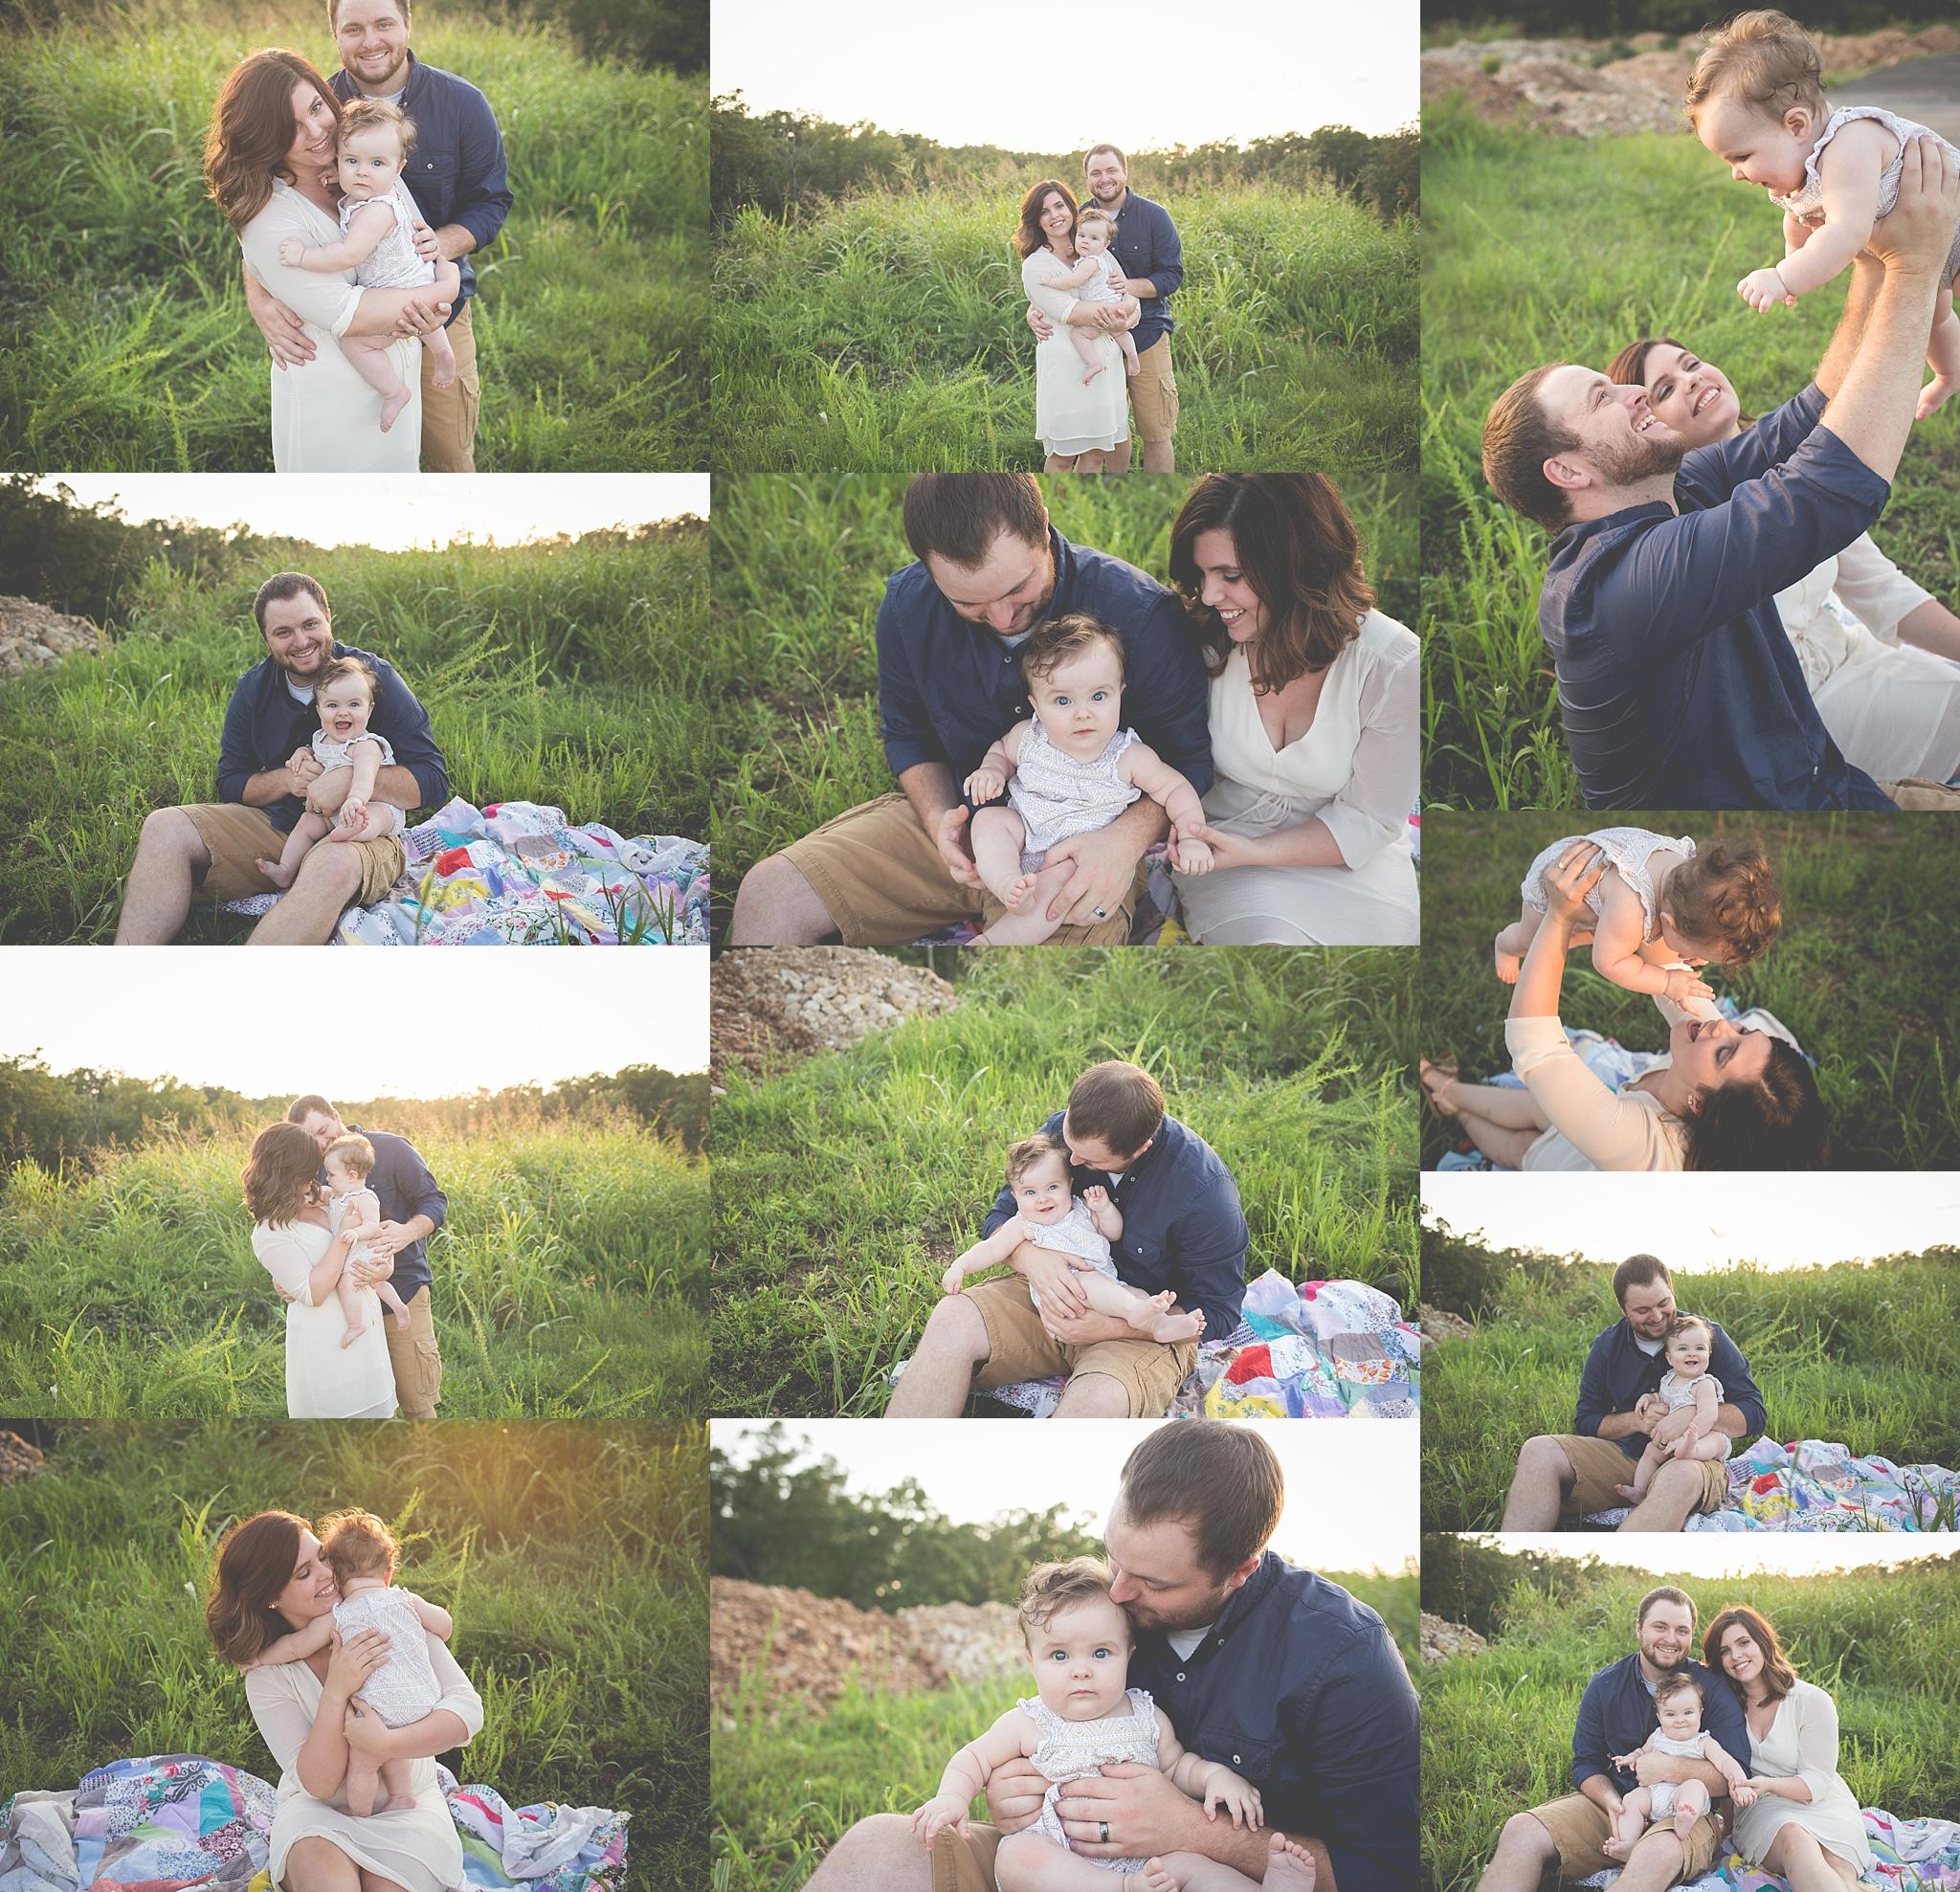 08-23-17-lake ozarks missouri family baby outdoor photography mini session.jpg